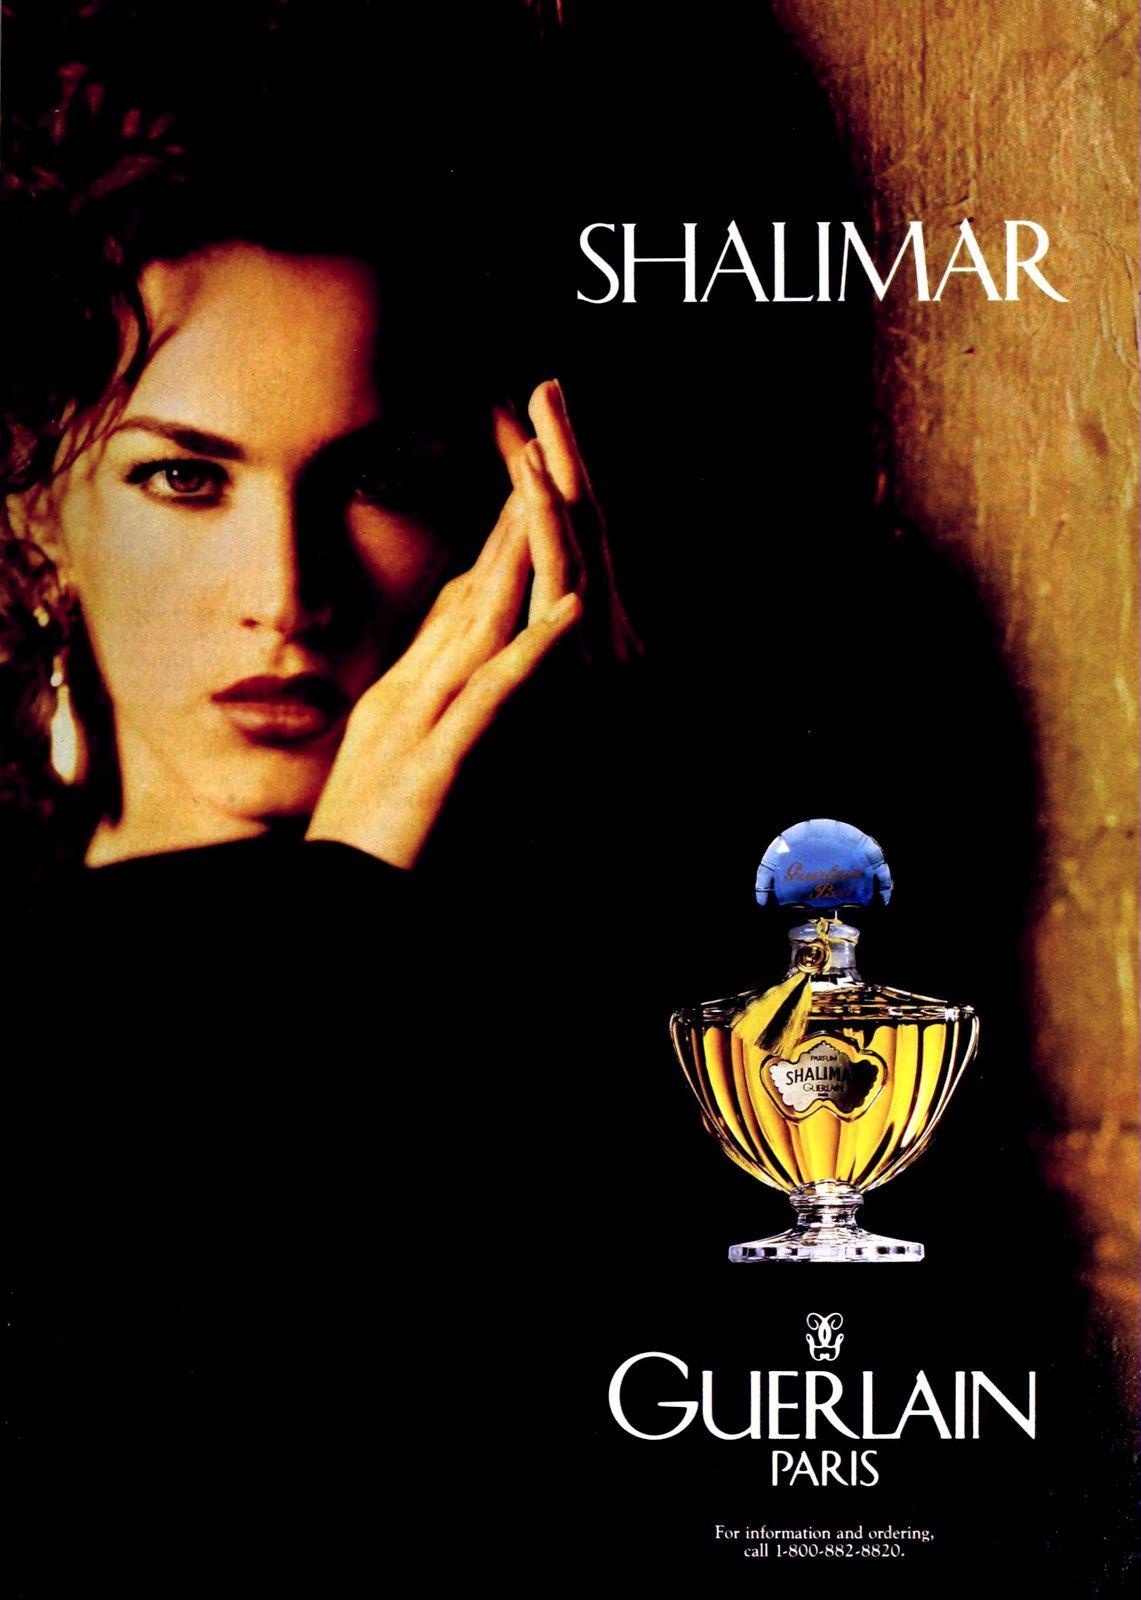 Popular vintage perfumes from the '90s - Shalimar from Guerlain Paris (1991) at ClickAmericana.com